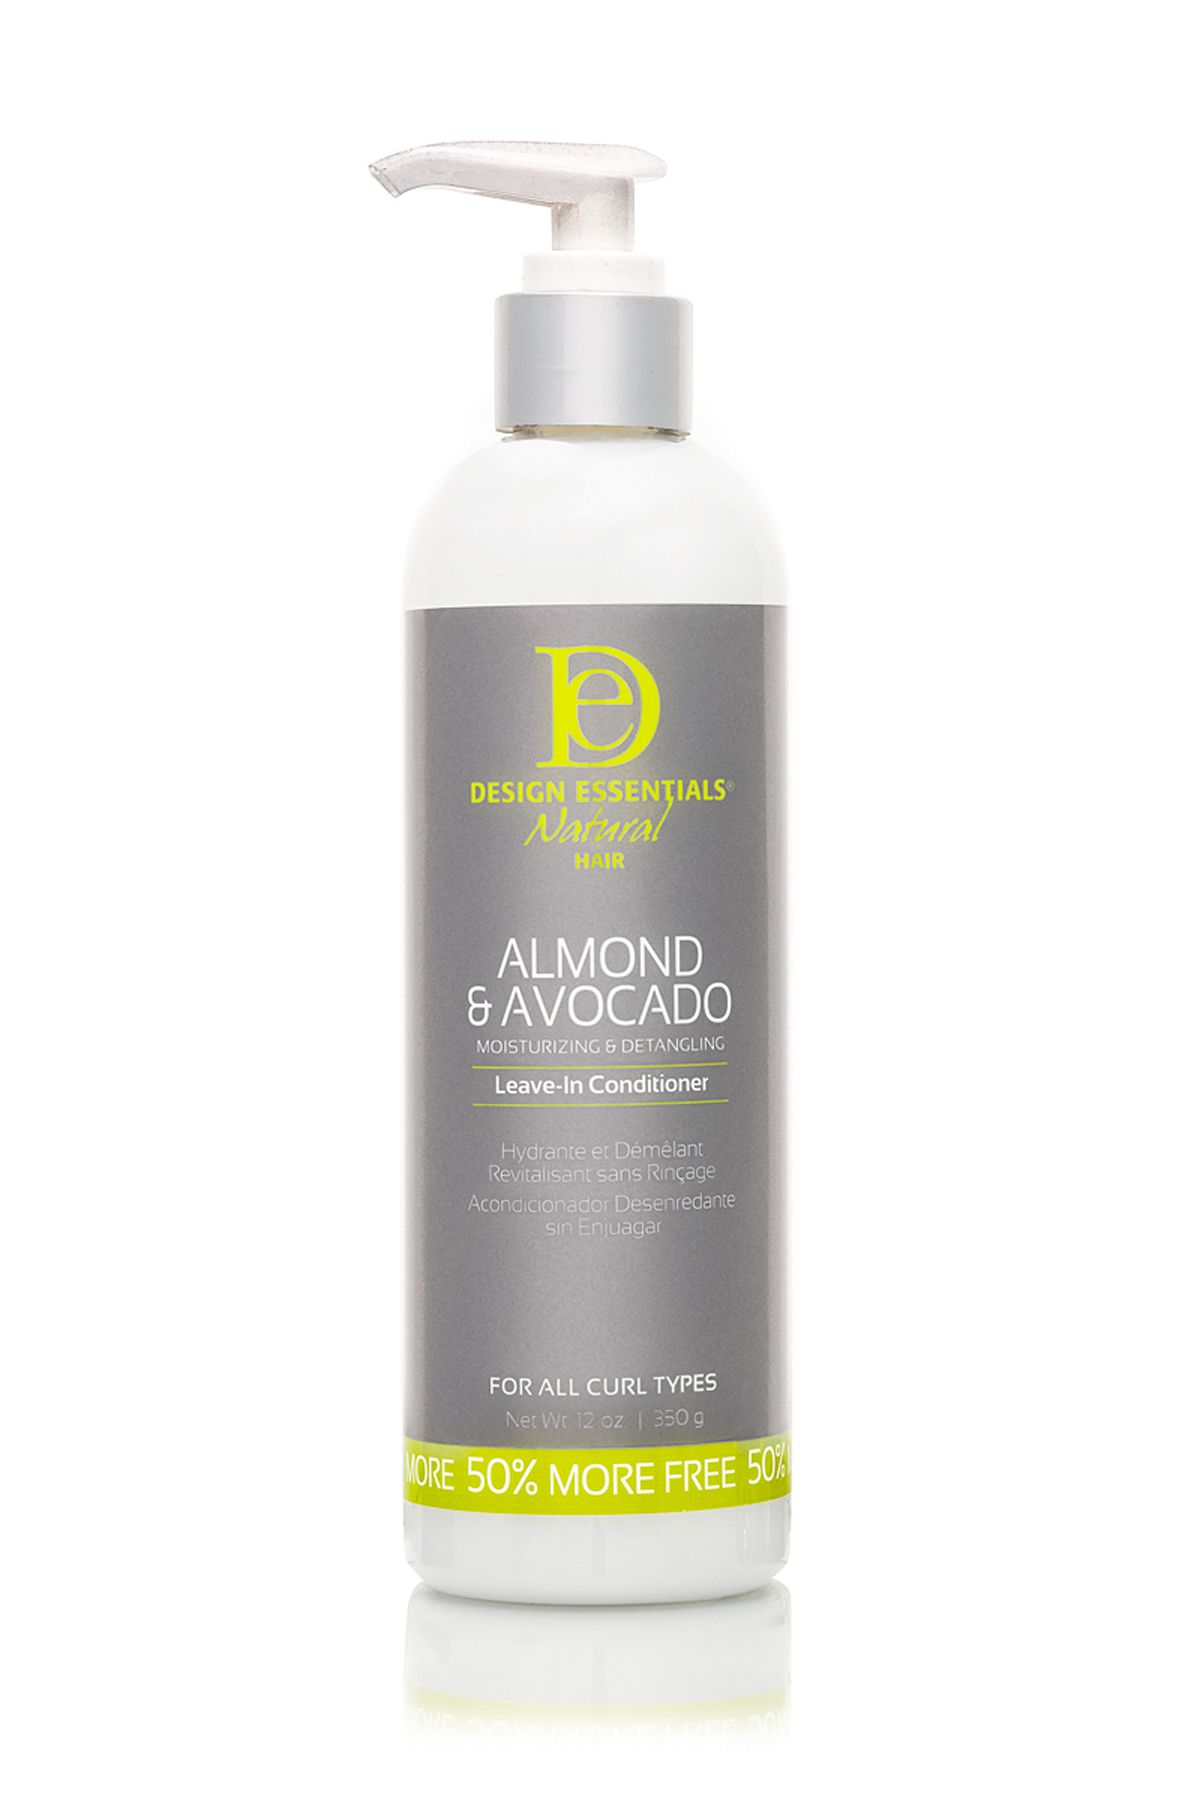 Design Essentials Almond + Avocado Leave-In